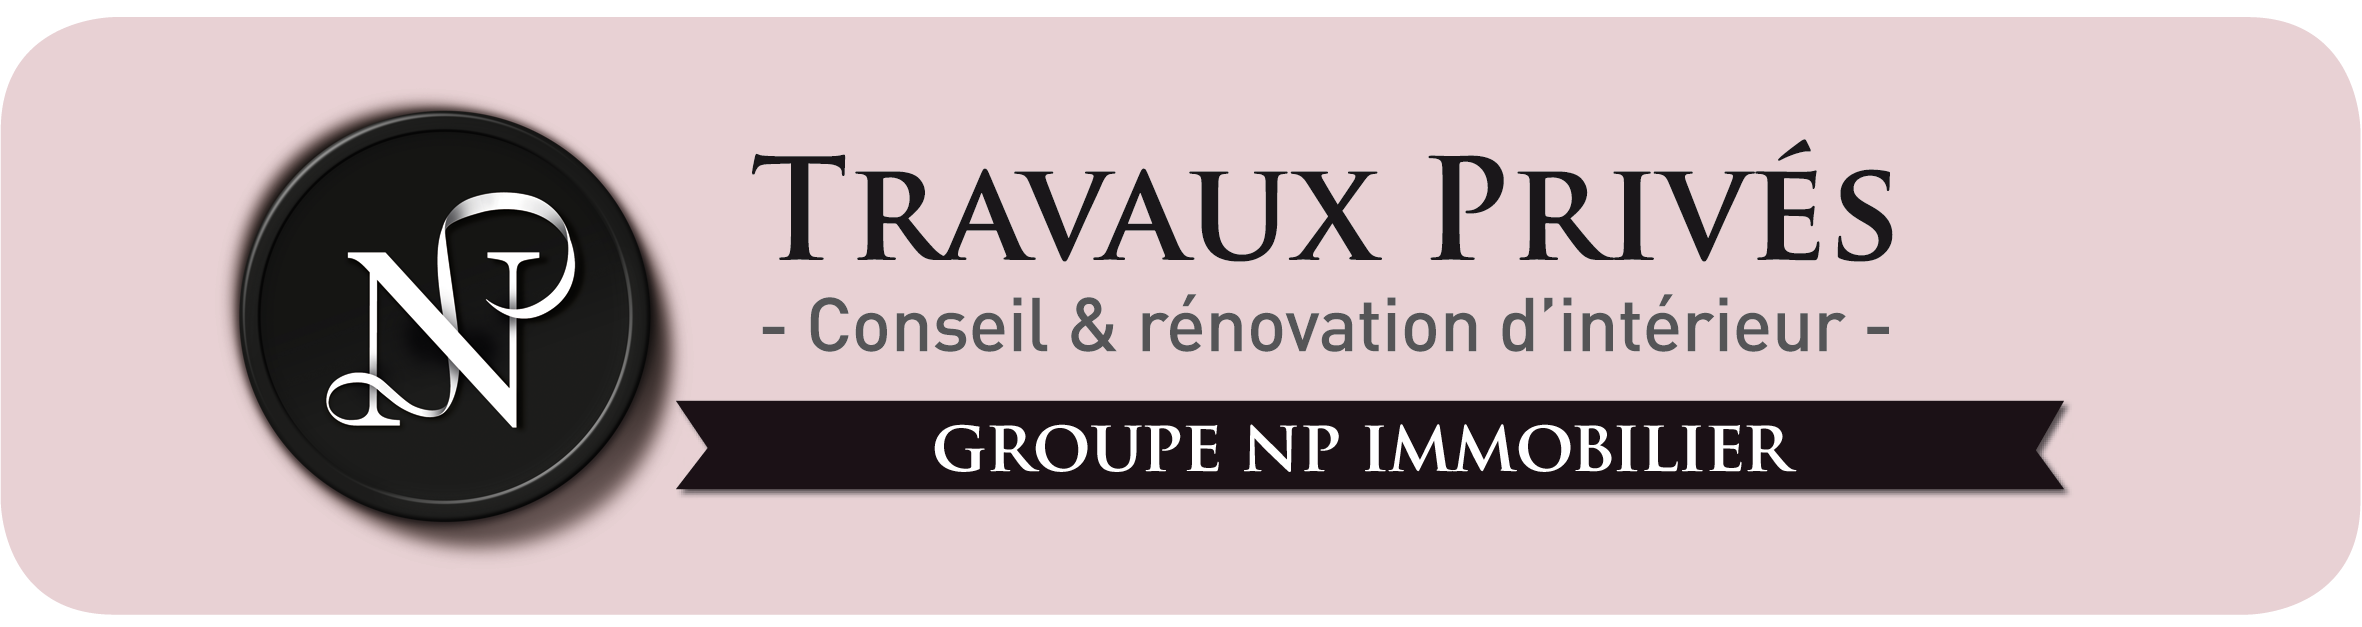 TRAVAUX PRIVES